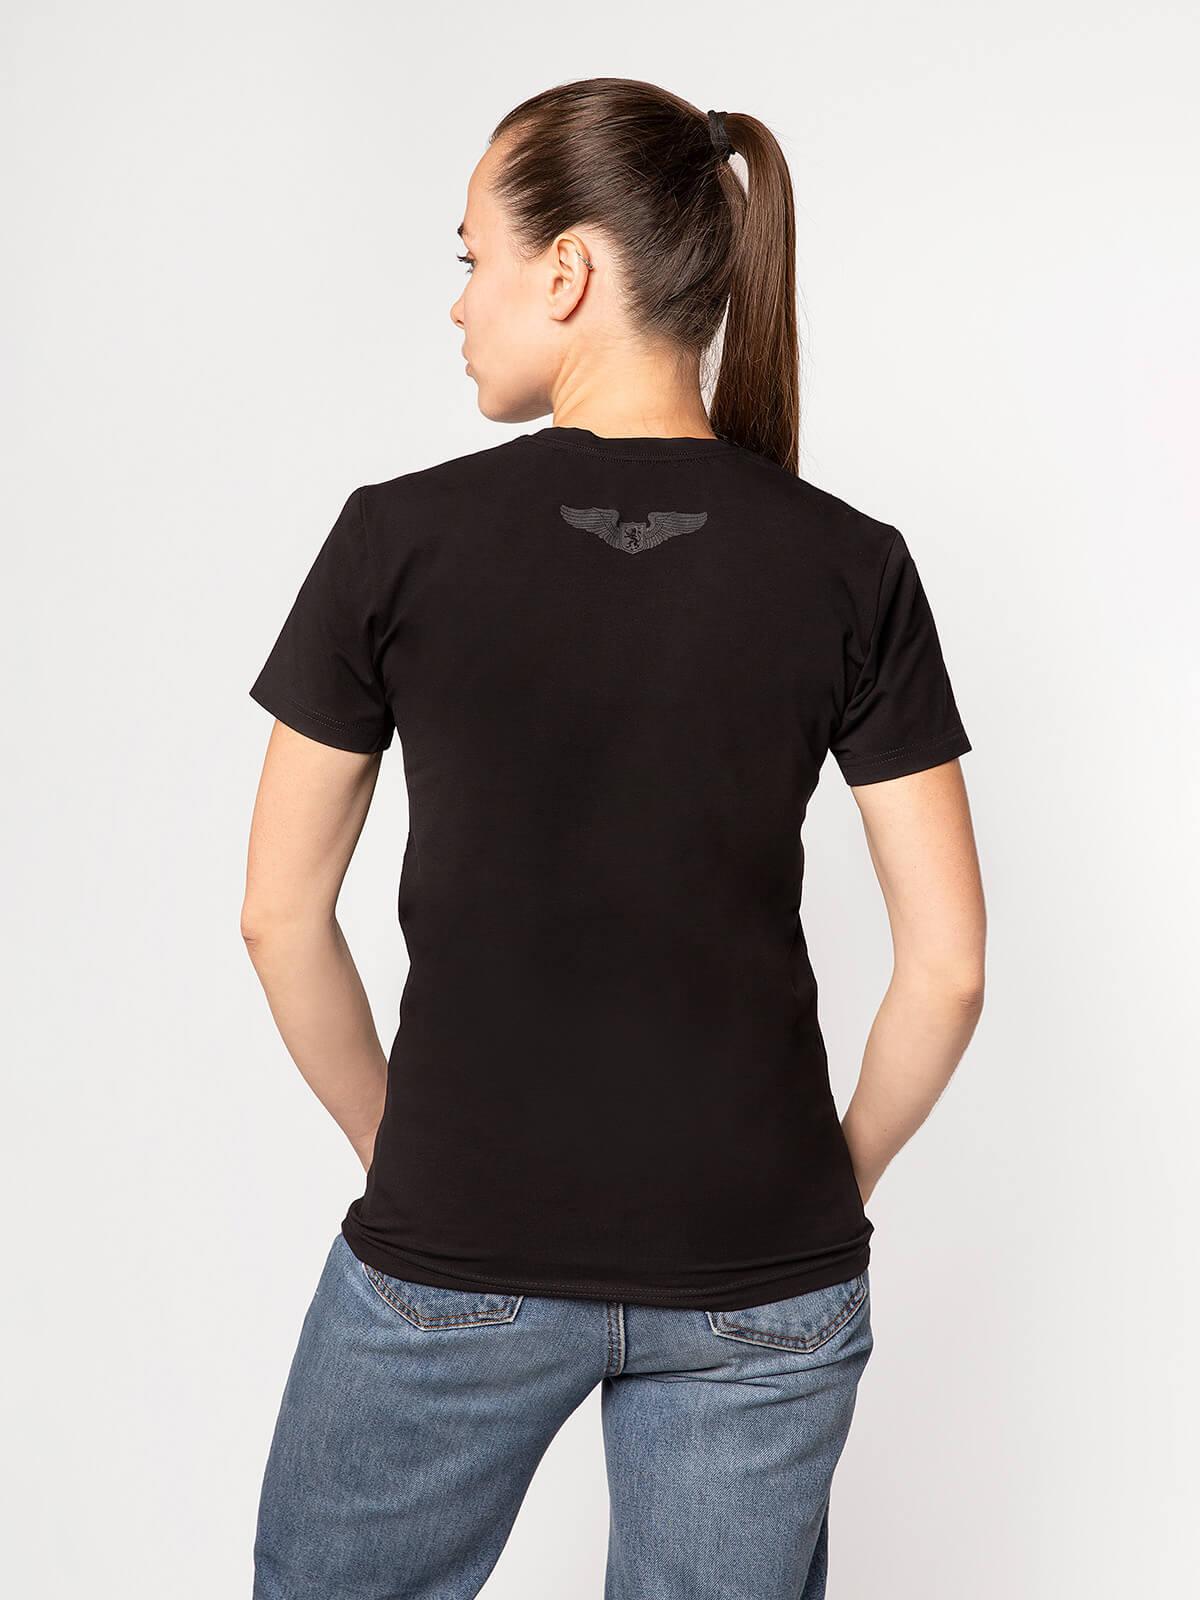 Women's T-Shirt Lion (Roundel). Color black.  Technique of prints applied: silkscreen printing.